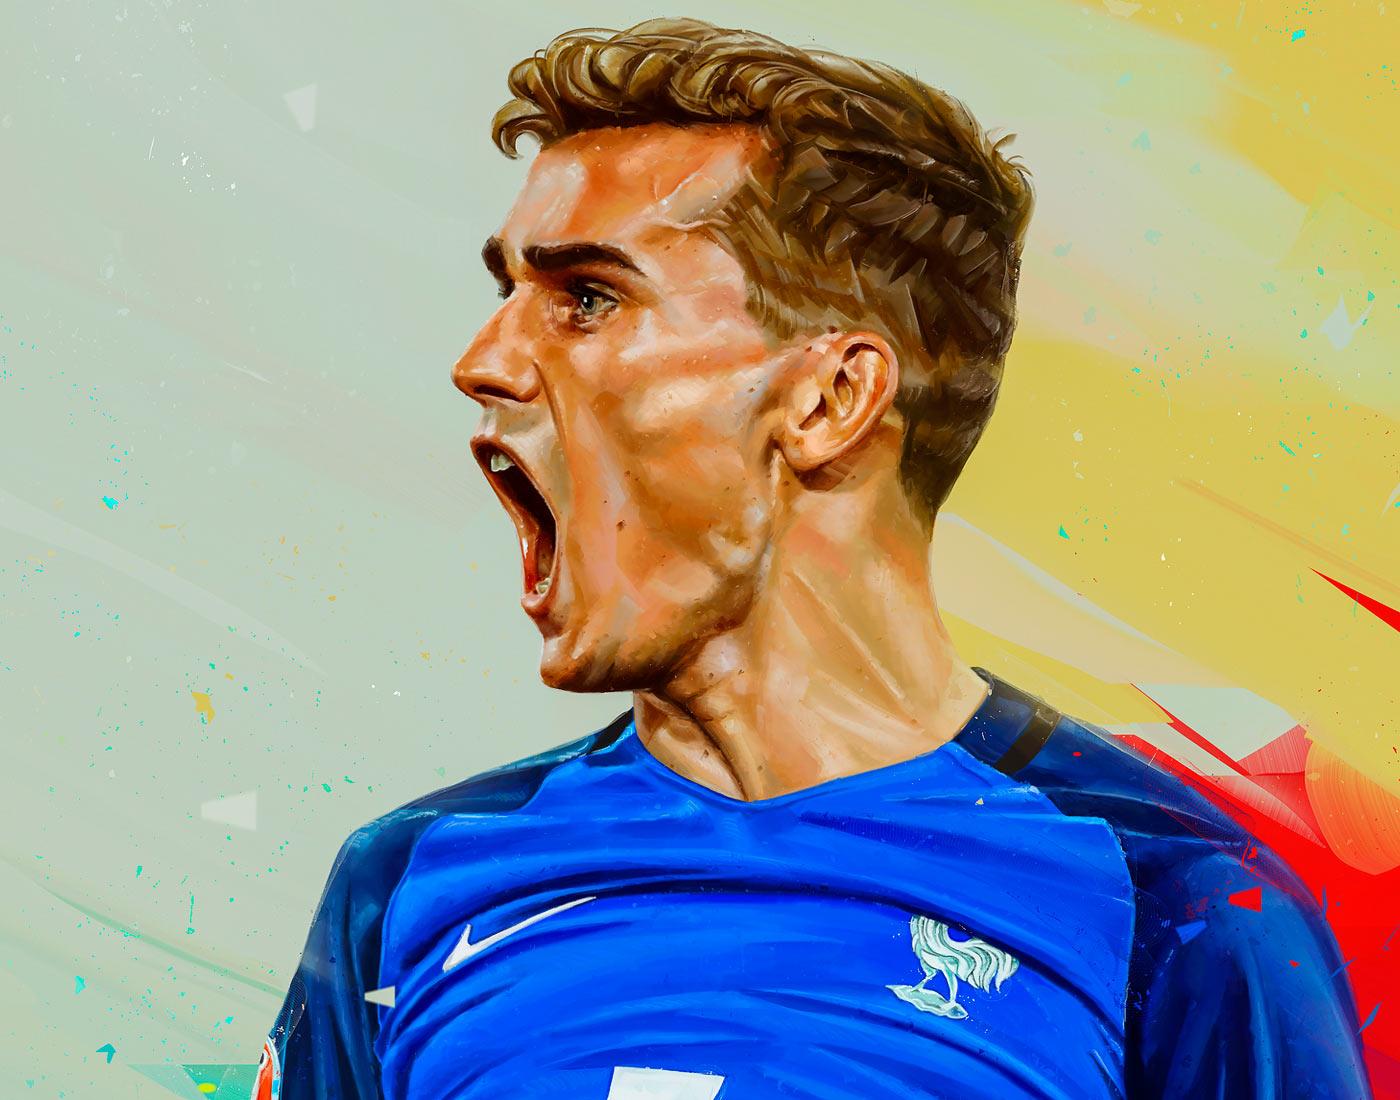 Digital Art & Illustration Inspiration - Soccer Art by Denis Gonchar